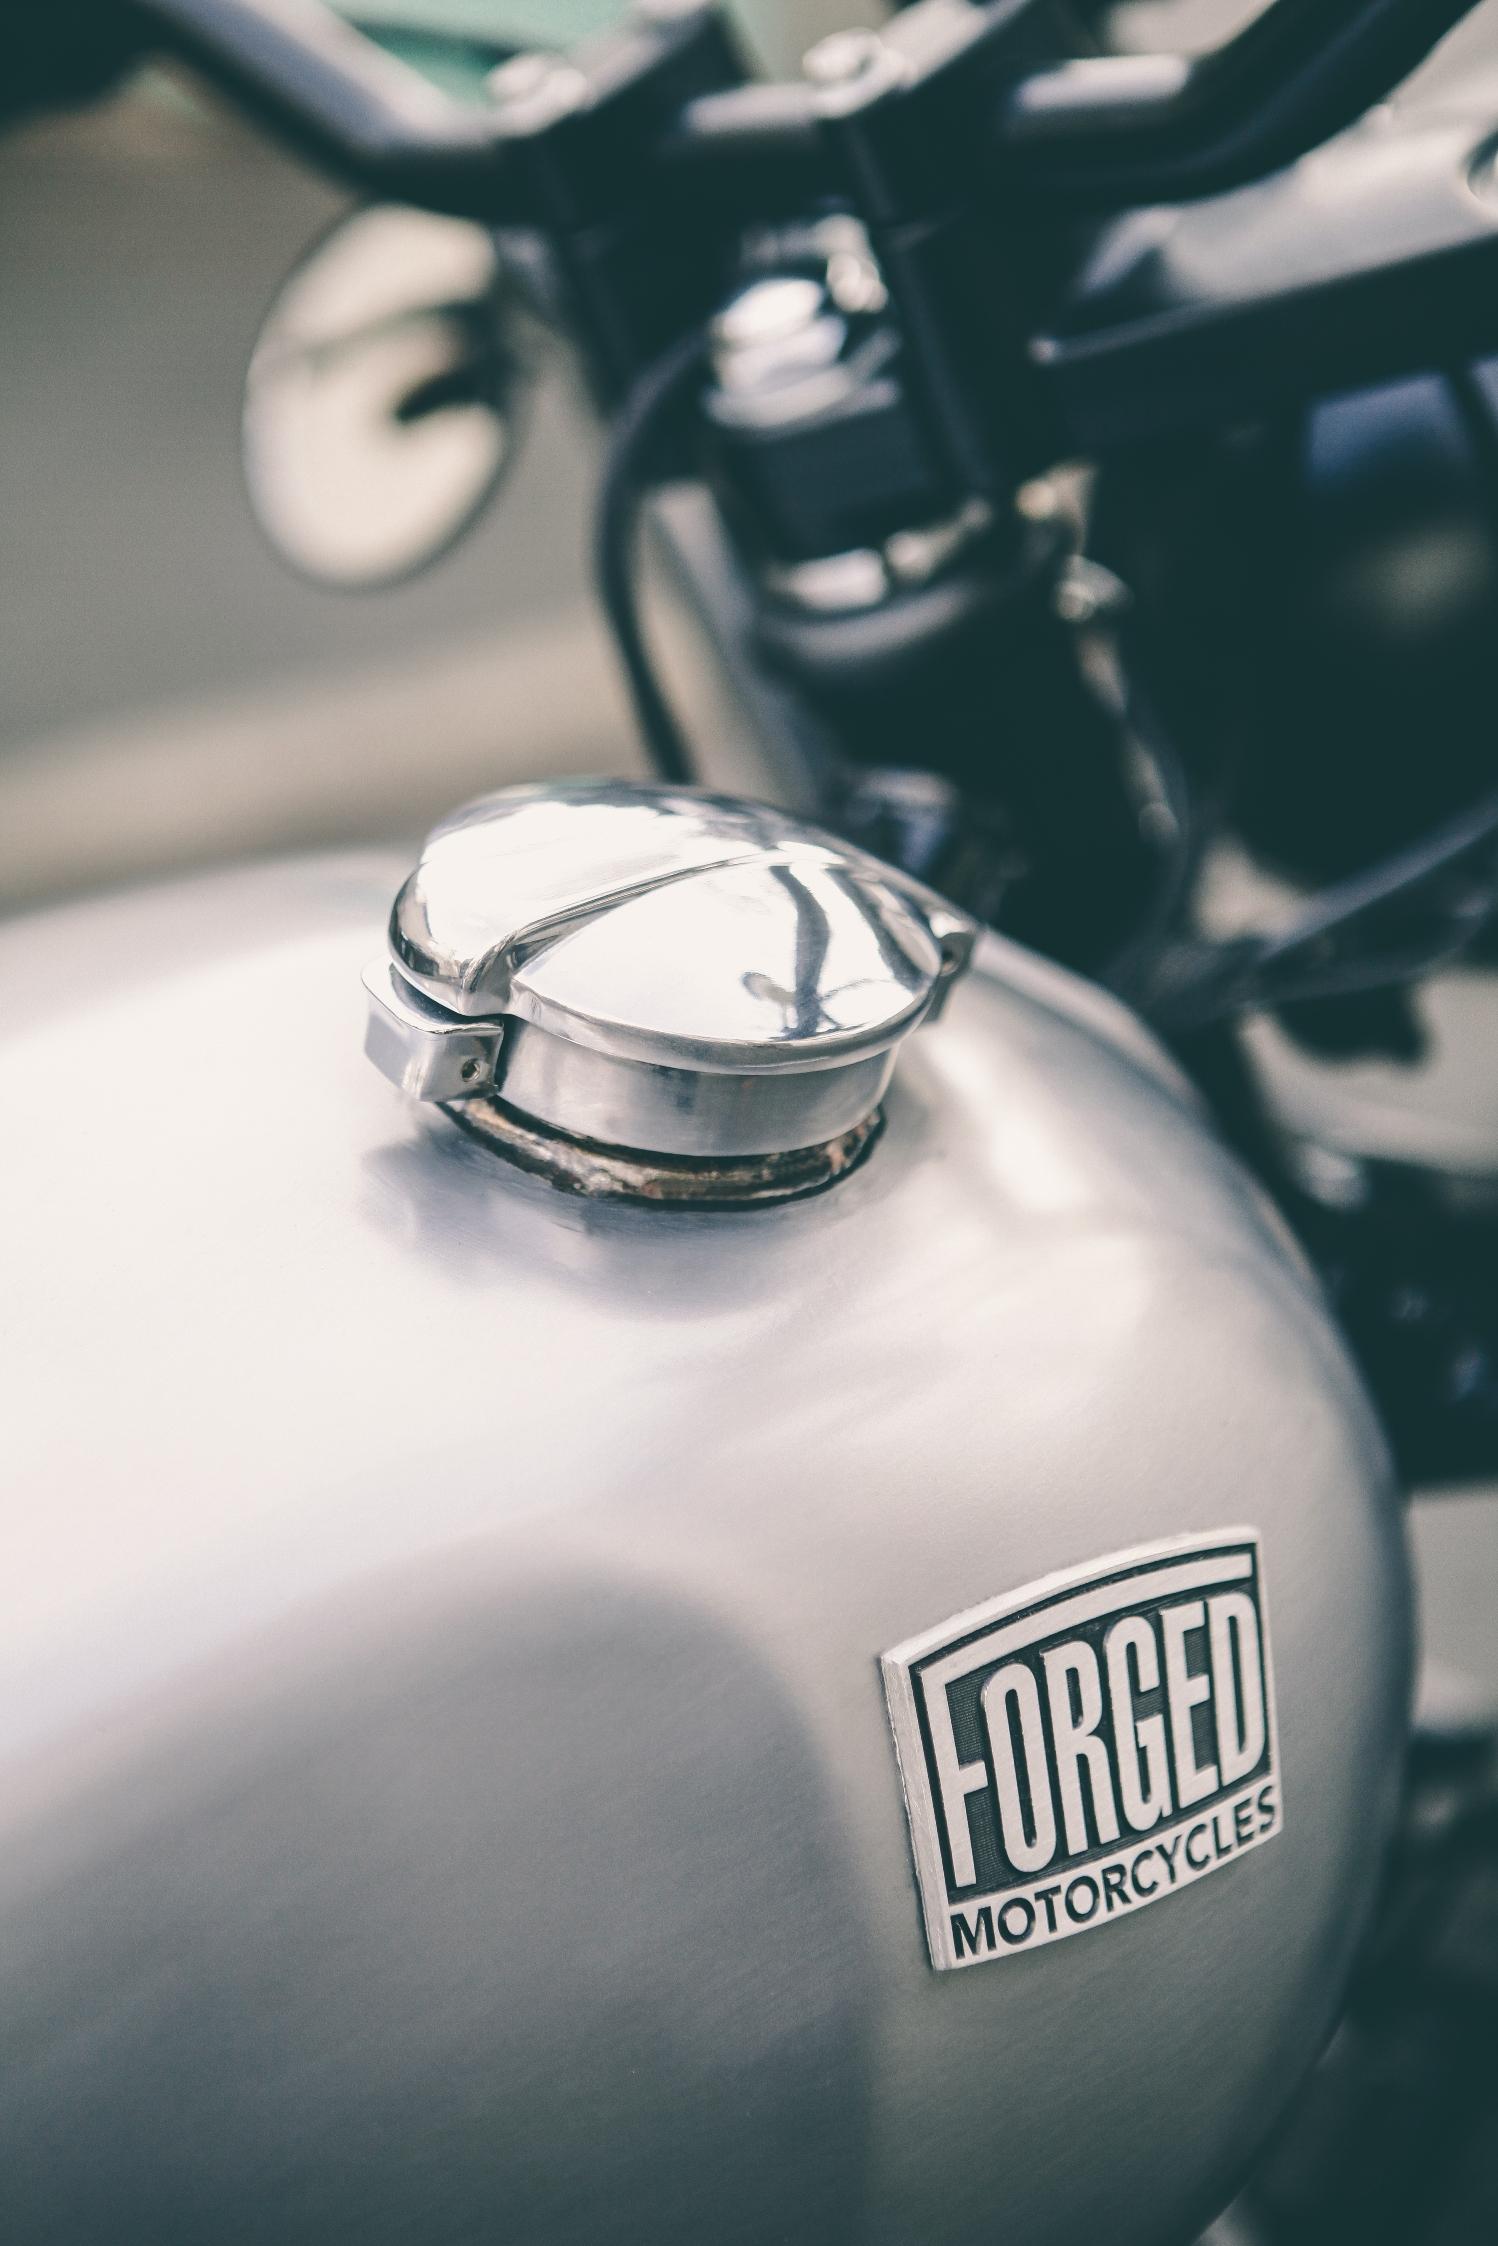 Forged Motorcycles van van scrambler 4h10.com